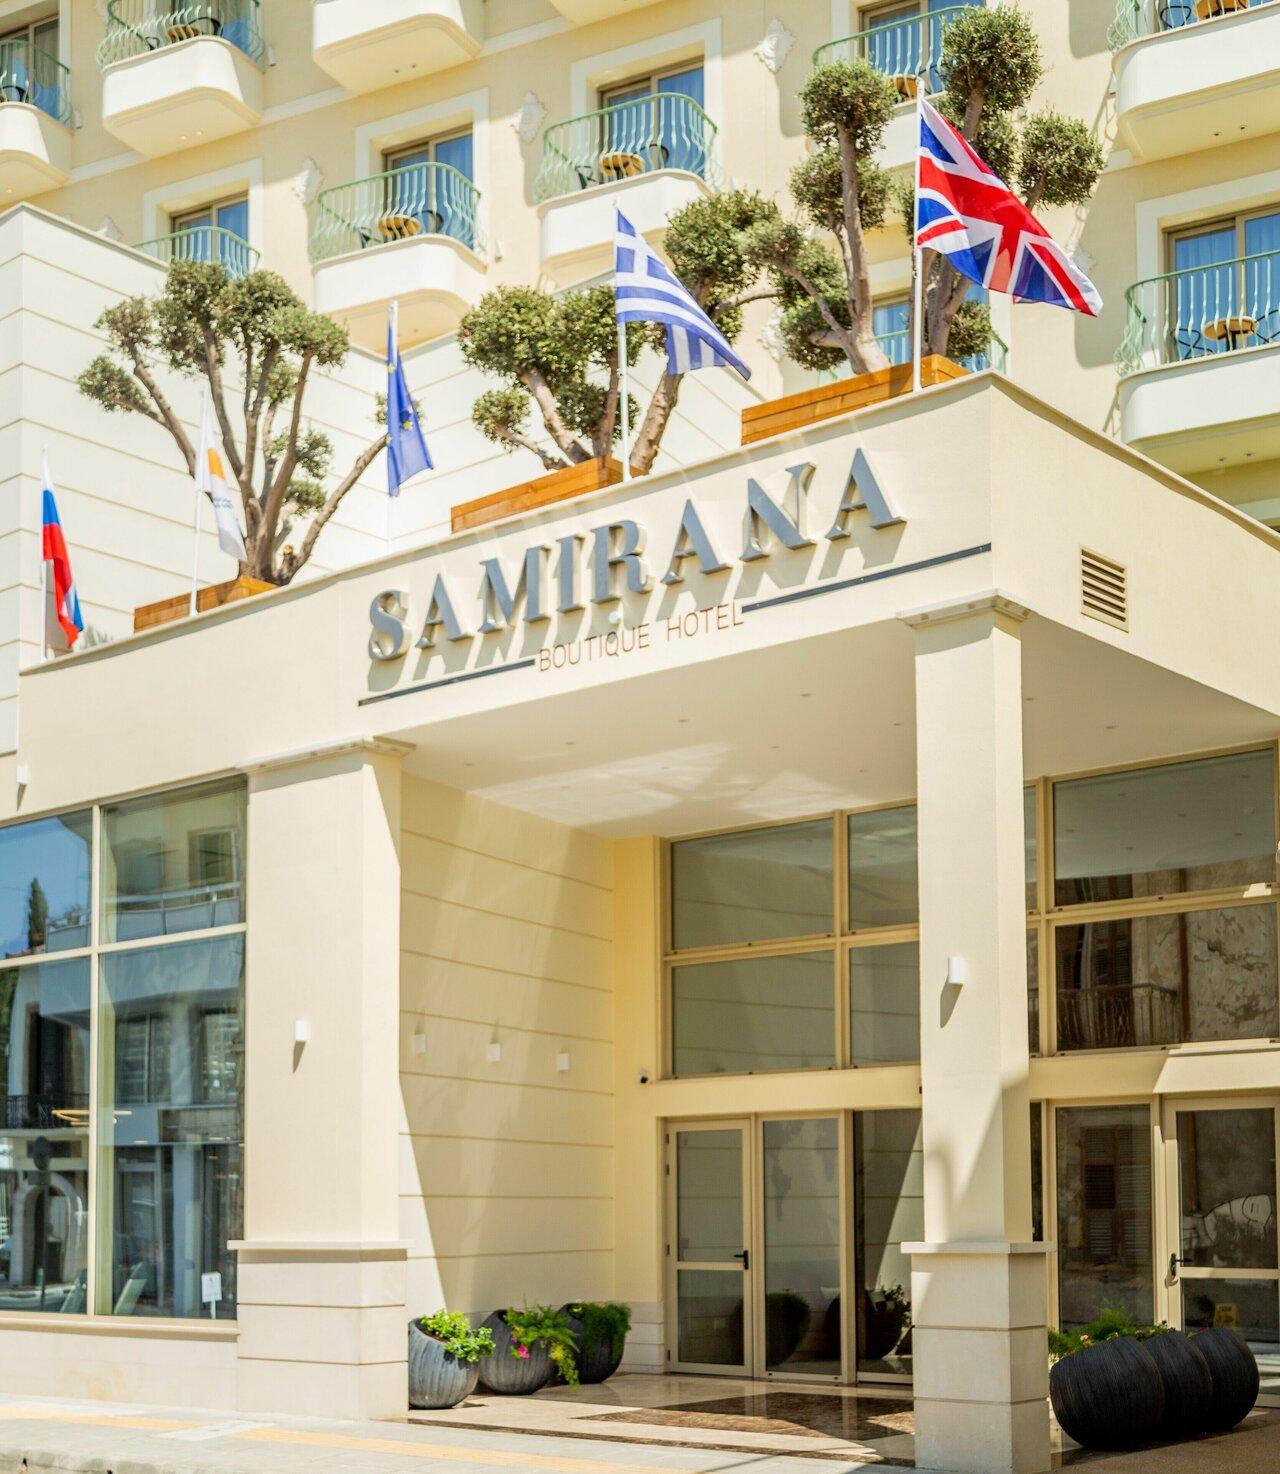 Samirana Boutique